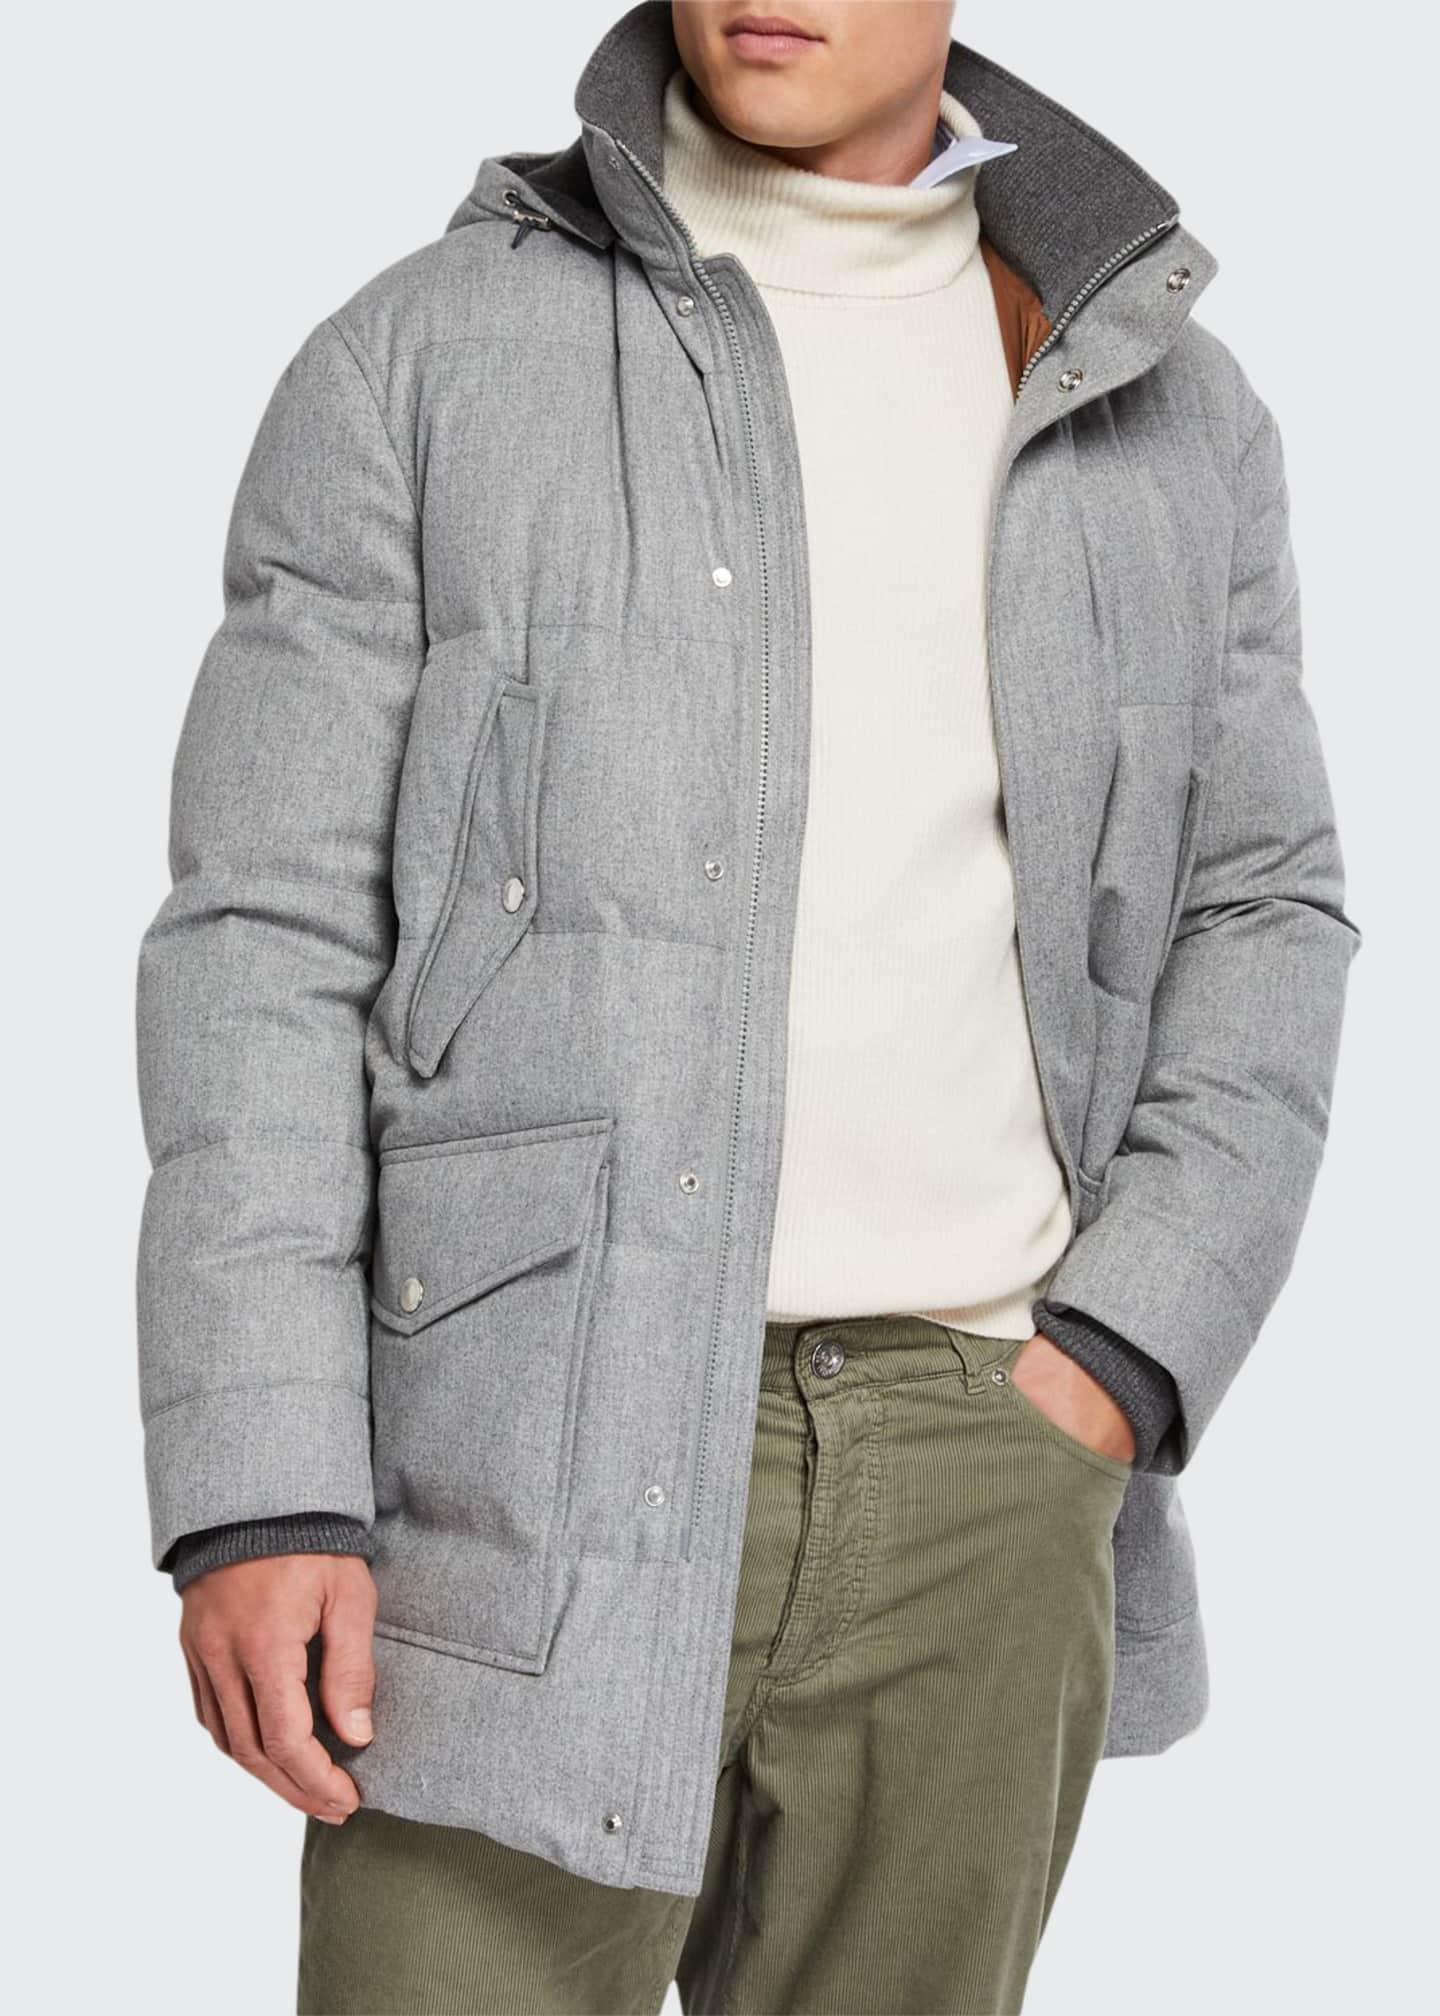 Brunello Cucinelli Men's Flannel Hooded Parka